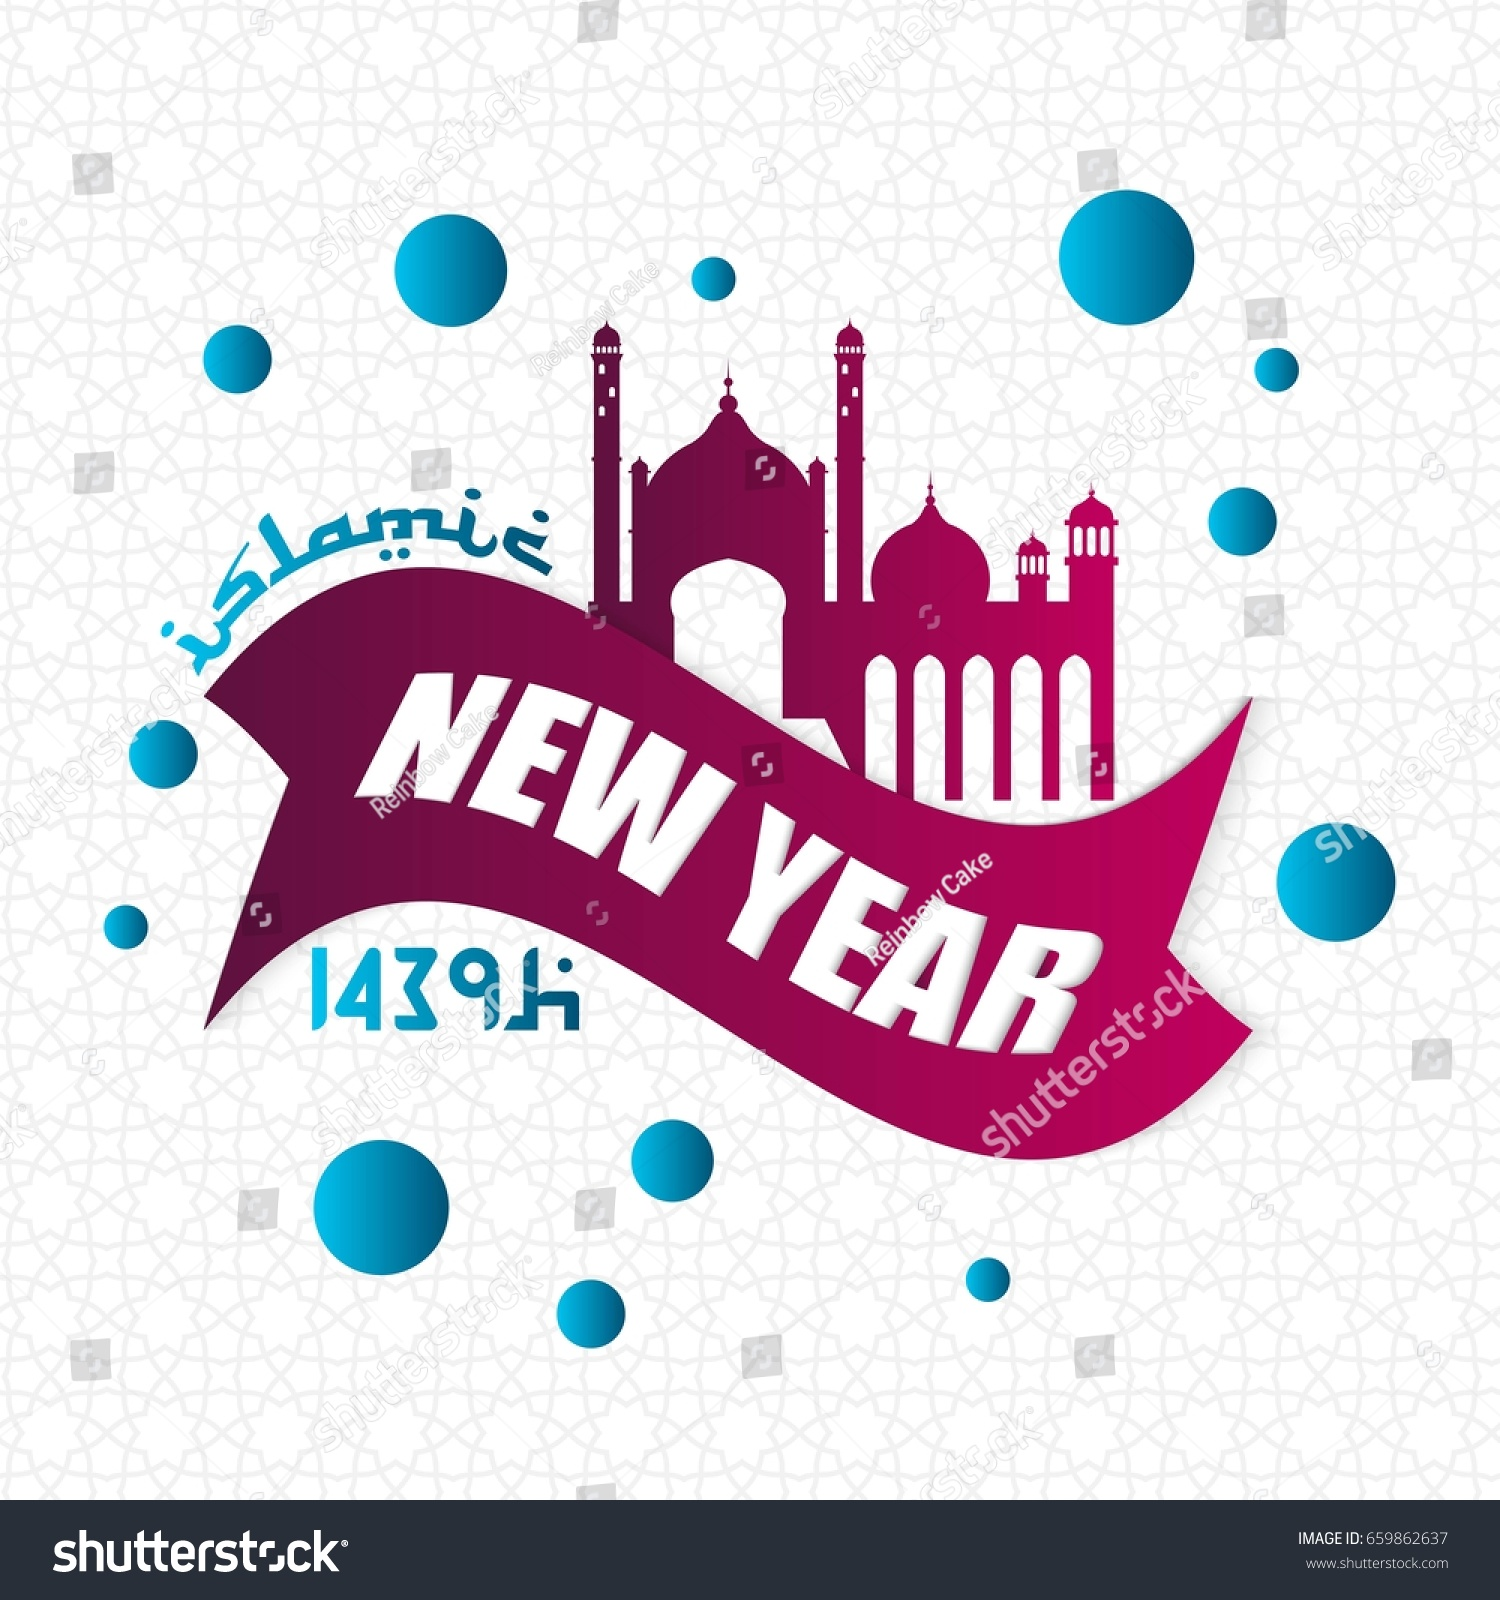 Happy new hijri year happy new stock vector 659862637 shutterstock happy new hijri year happy new year for all muslim community islamic new year kristyandbryce Images